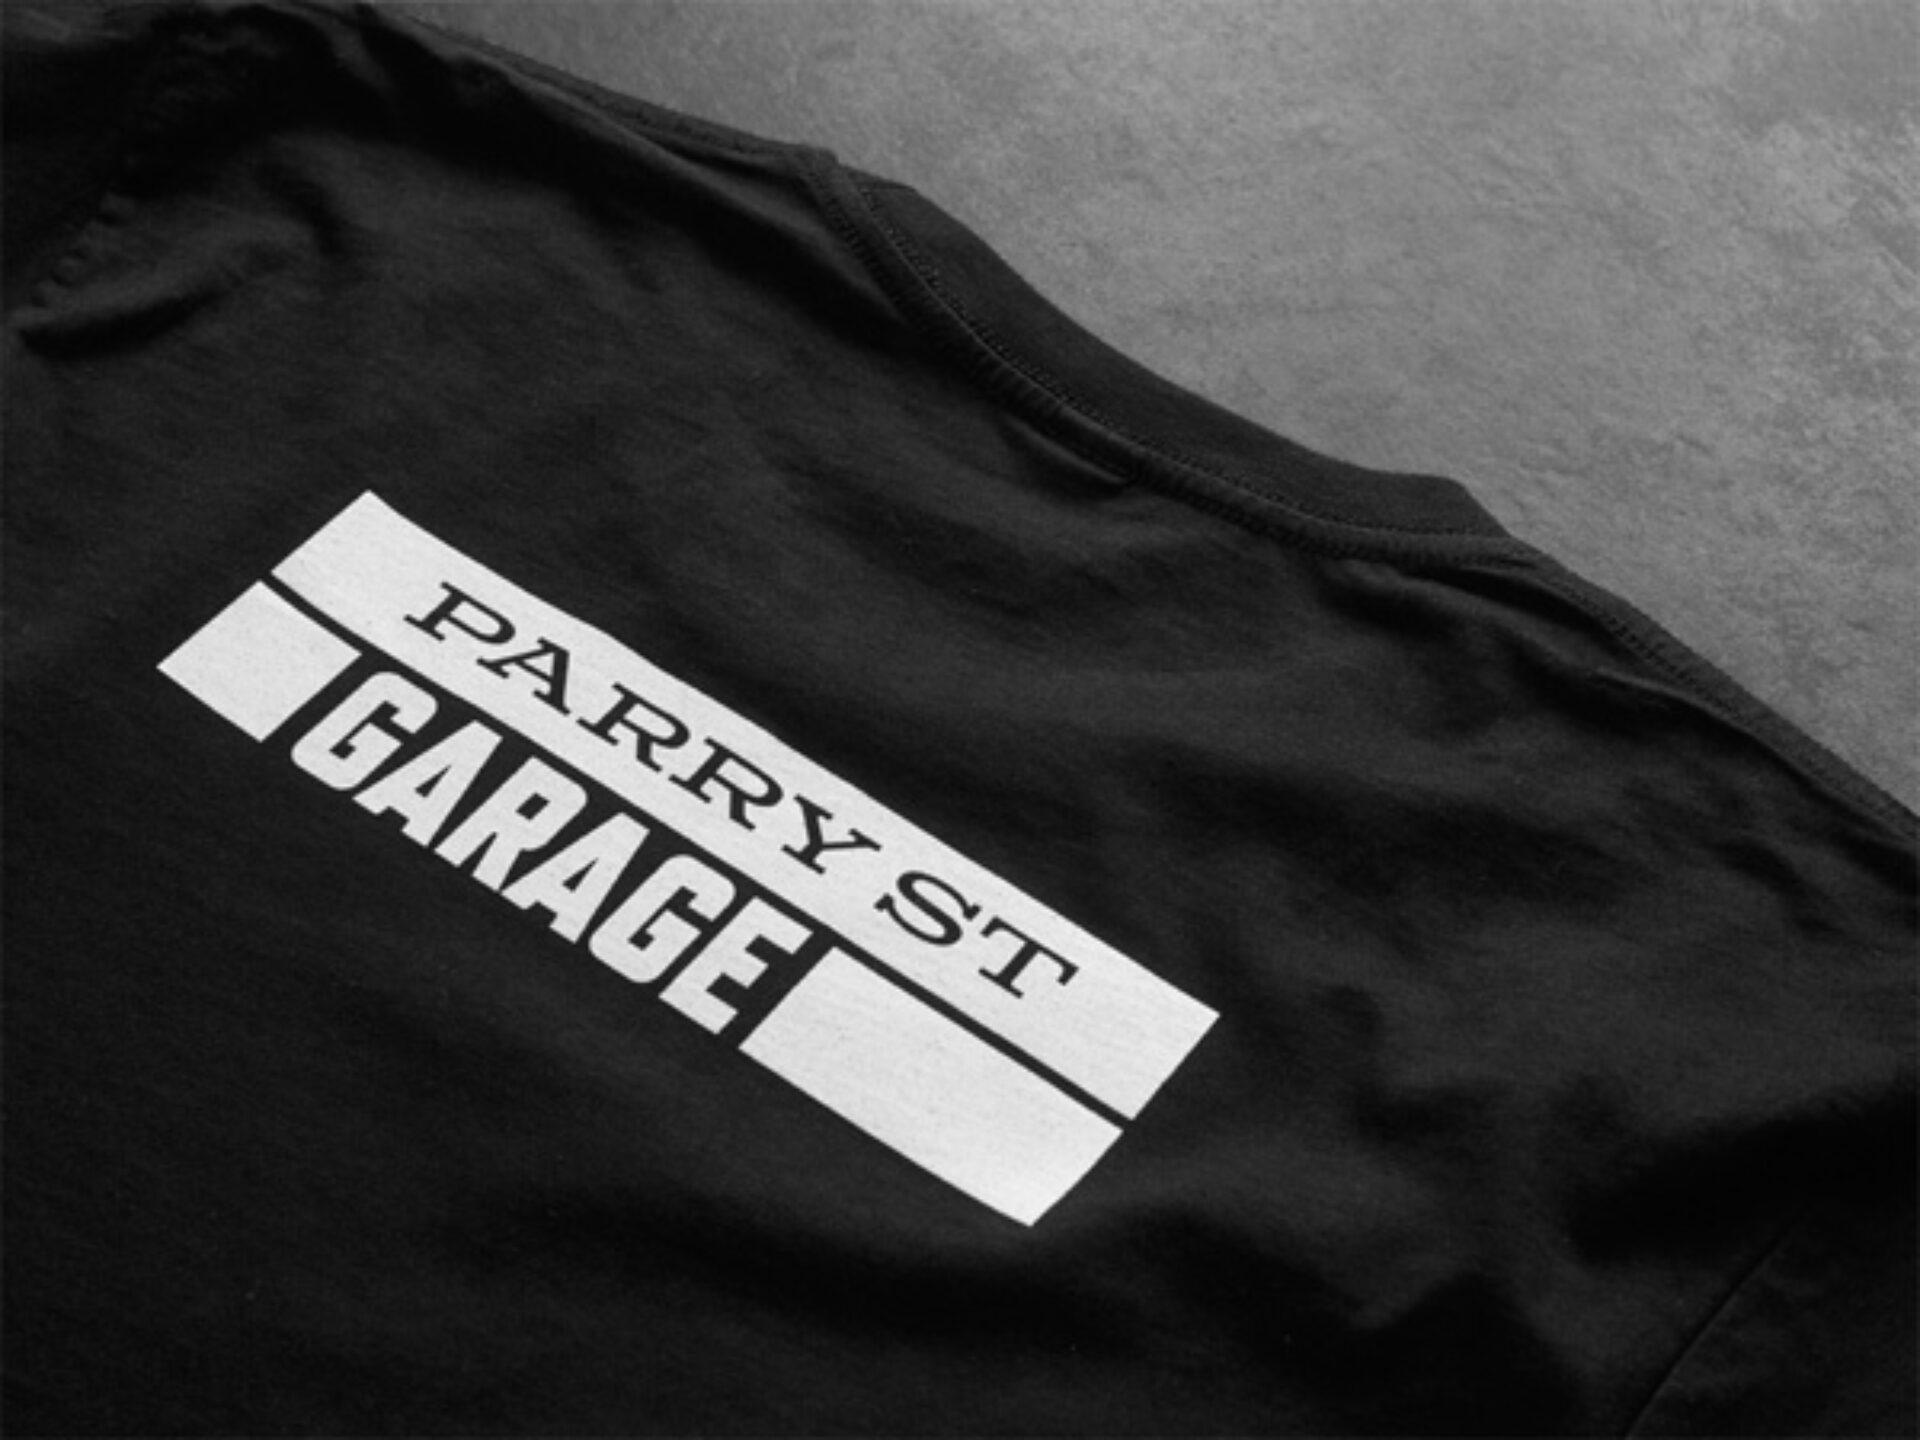 Headjam portfolio Parry Street Garage 019